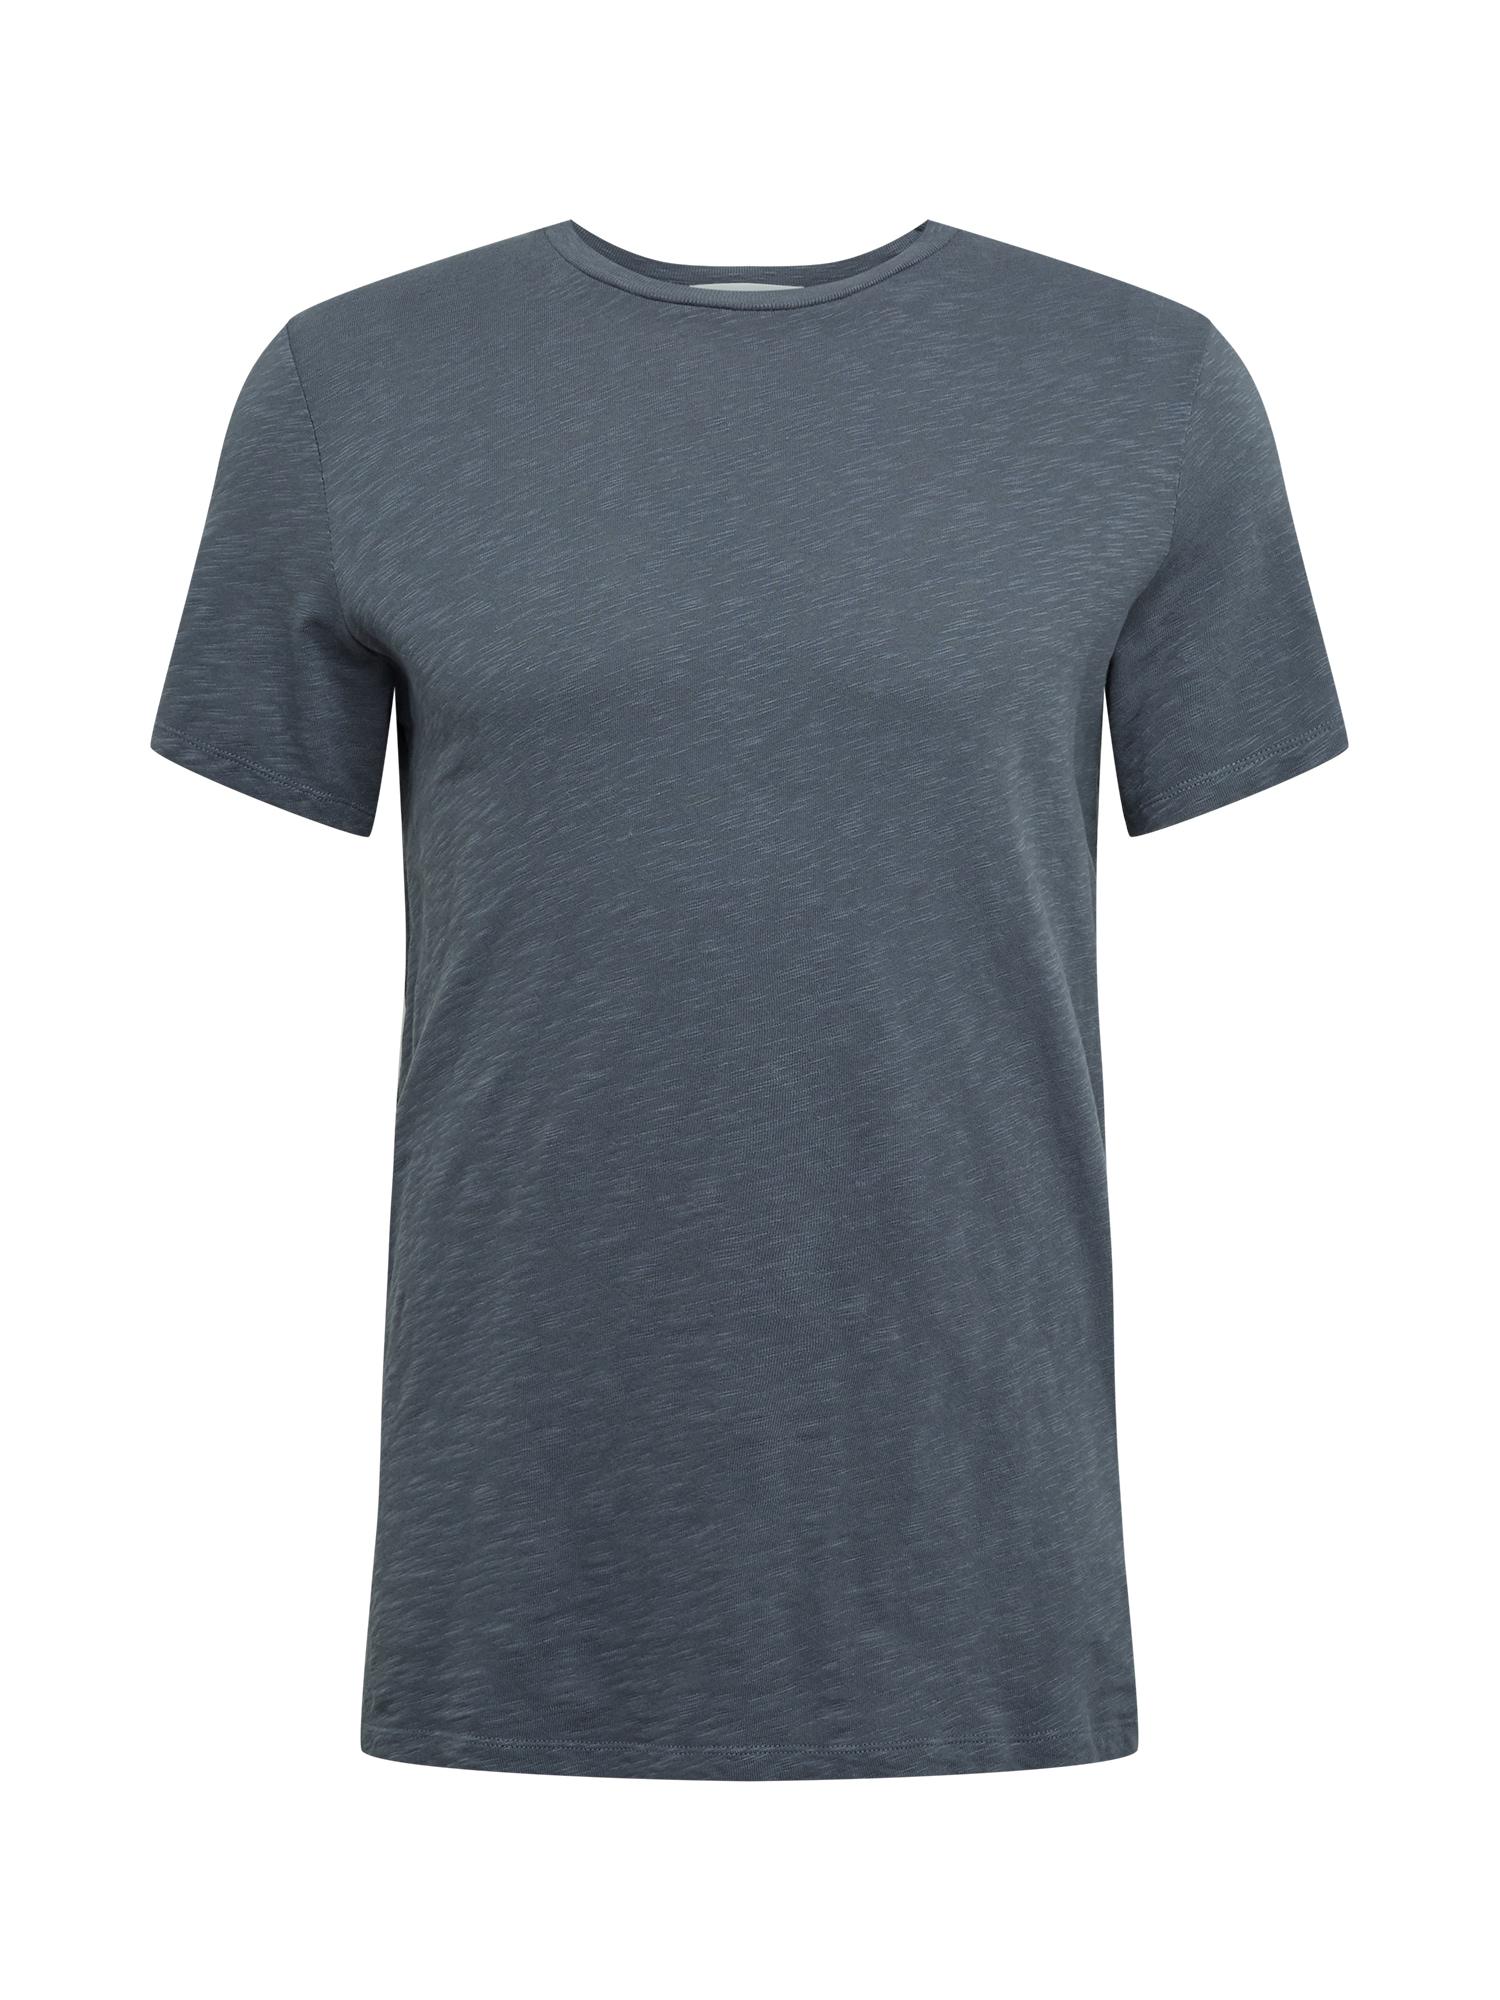 AMERICAN VINTAGE Marškinėliai 'Bysapick' tamsiai pilka